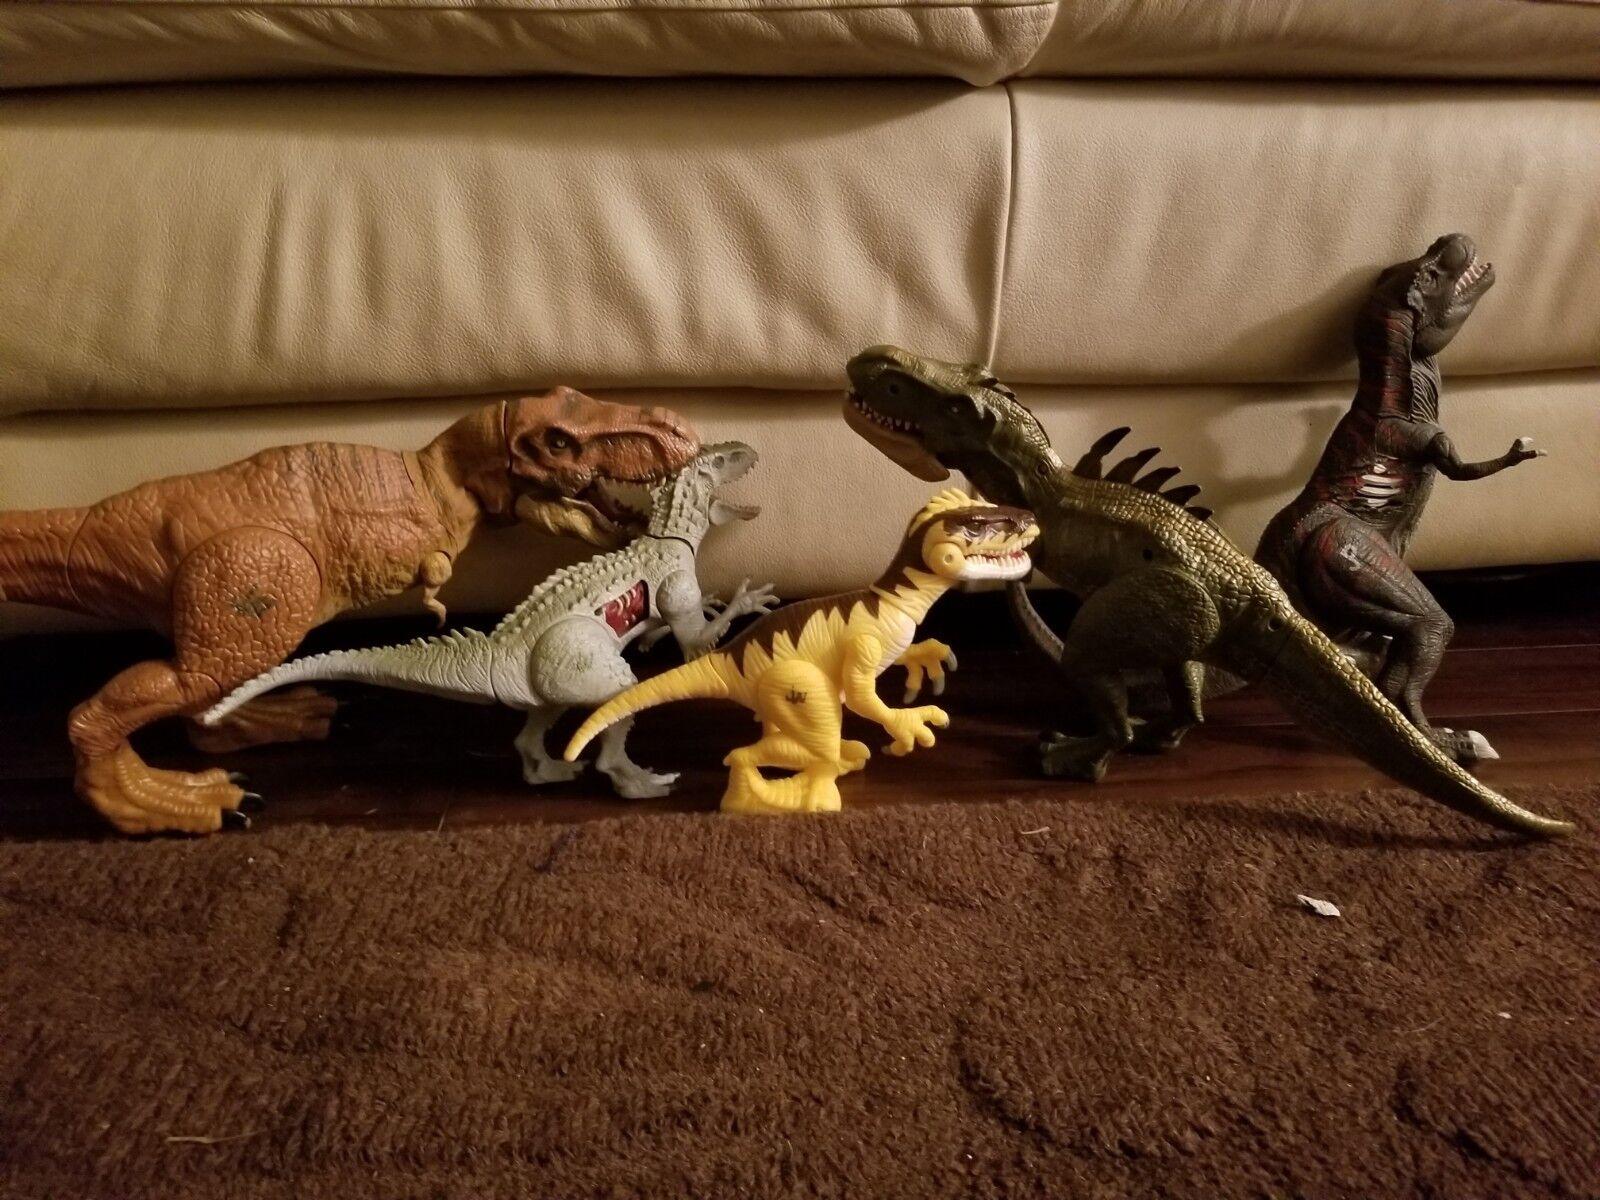 Los 5 jurassic park  world dinosaurier t. rex versandkosten